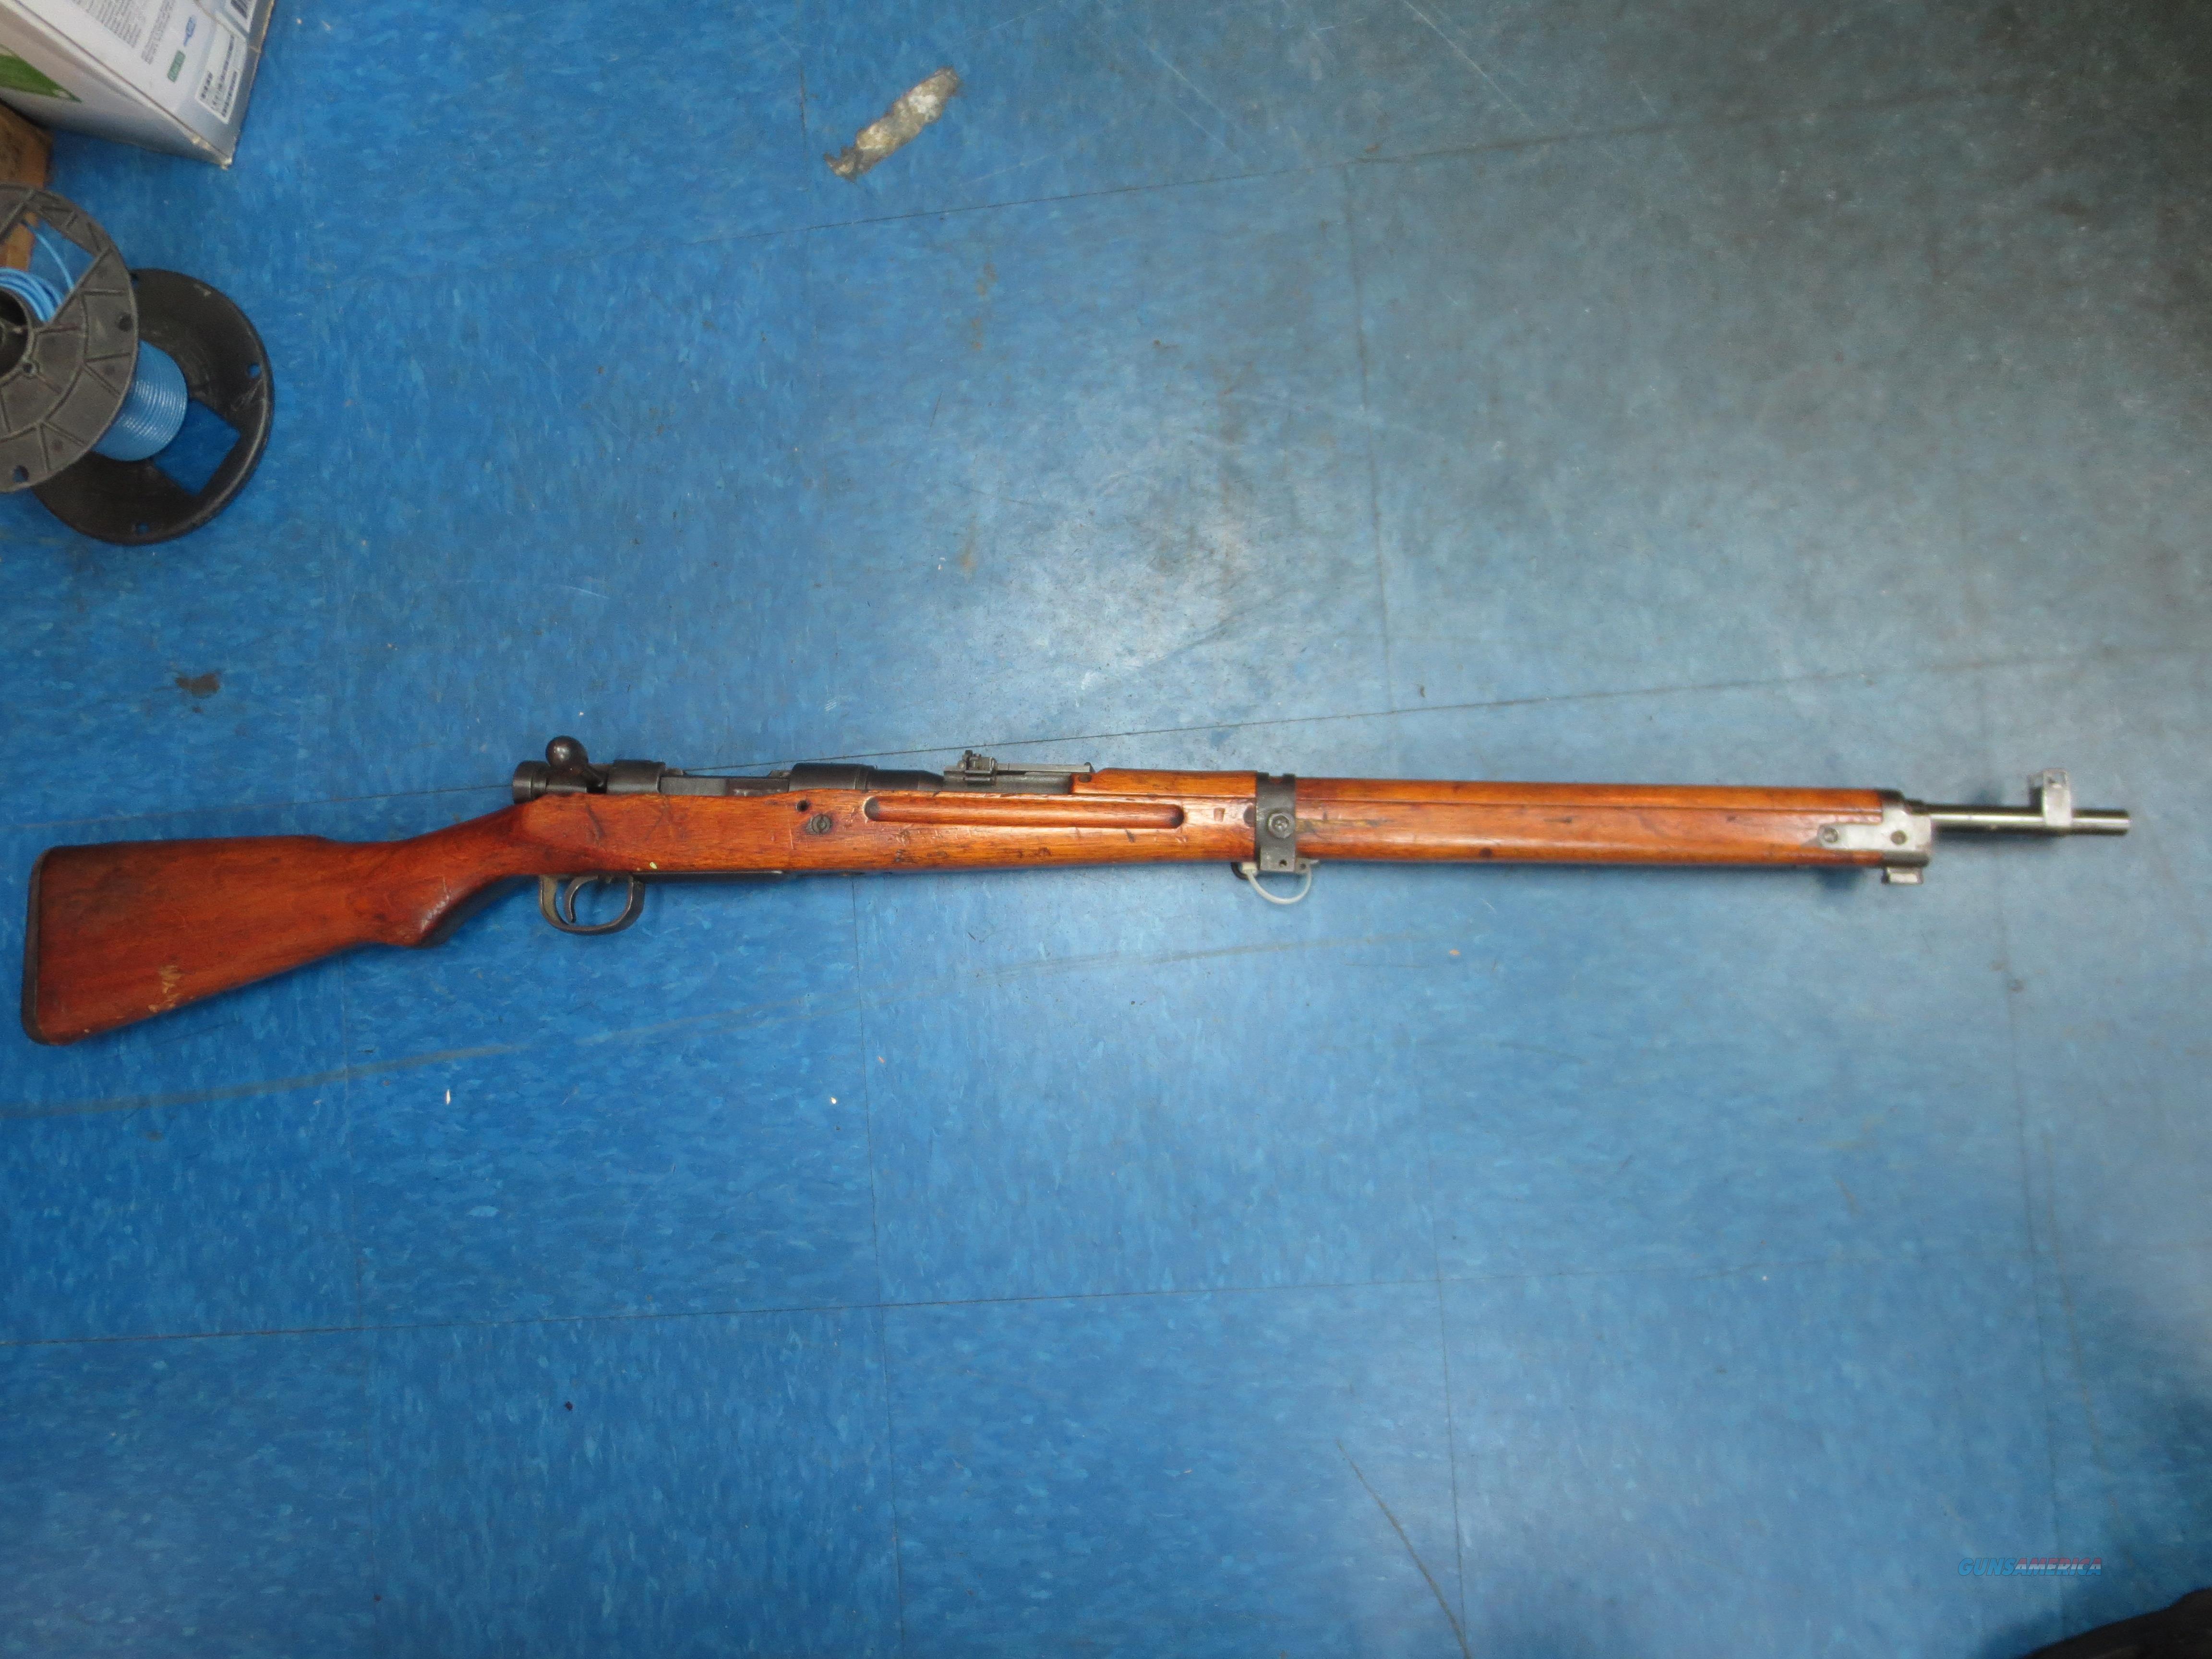 Japan Ariska rifle 7.7mm  Guns > Rifles > Military Misc. Rifles Non-US